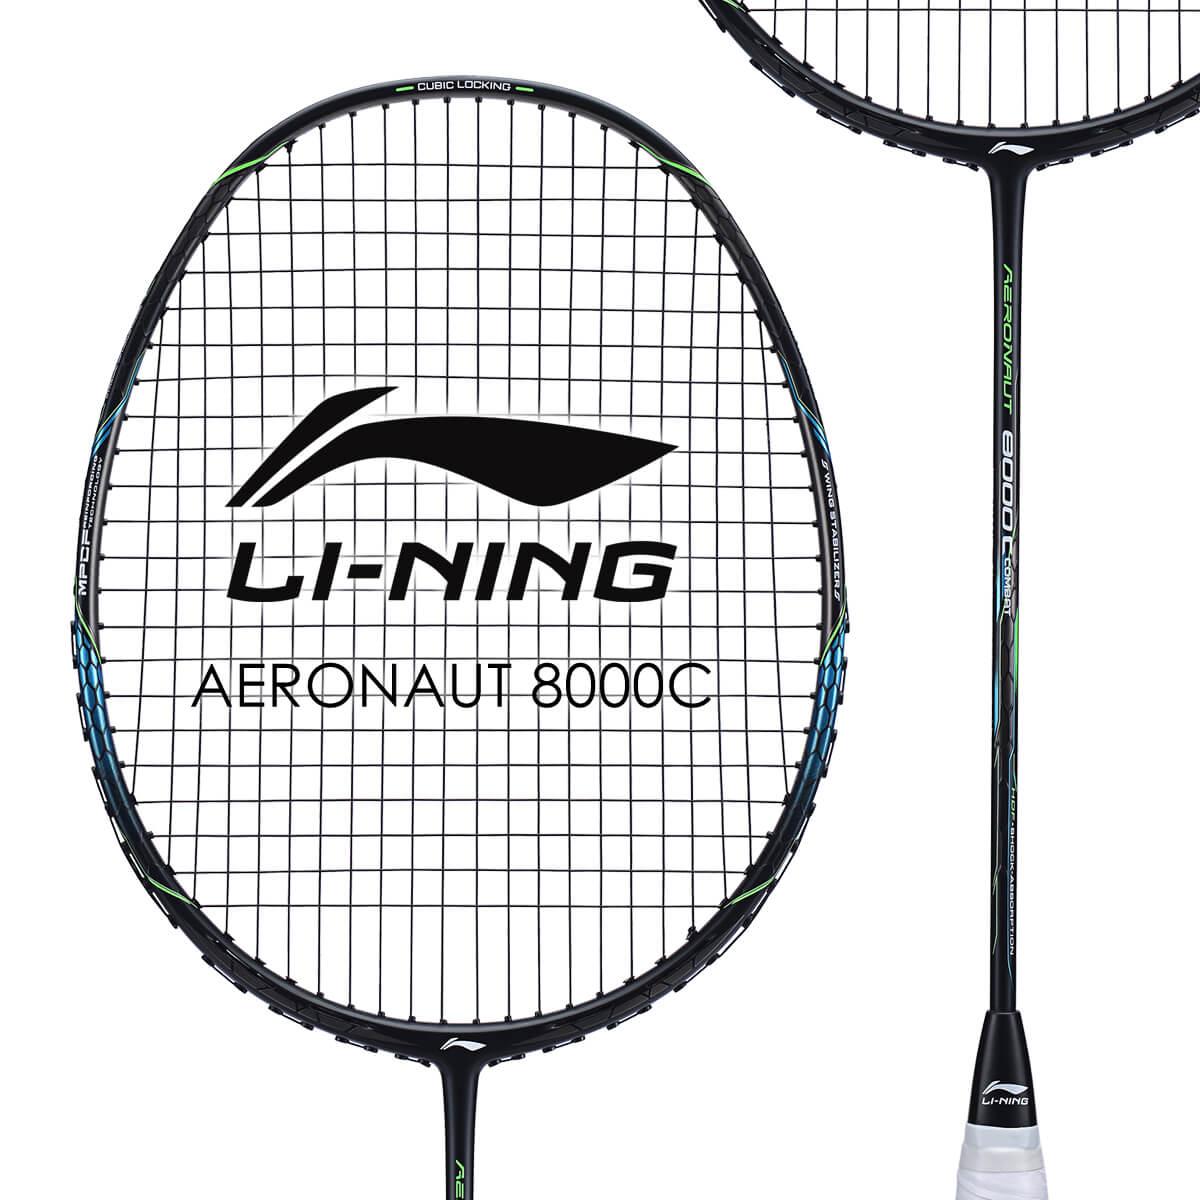 LI-NING AERONAUT 8000C(AN8000C) 風洞設計 AYPN216-1 バドミントンラケット リーニン【オススメガット&ガット張り工賃無料/ 日本バドミントン協会審査合格品】